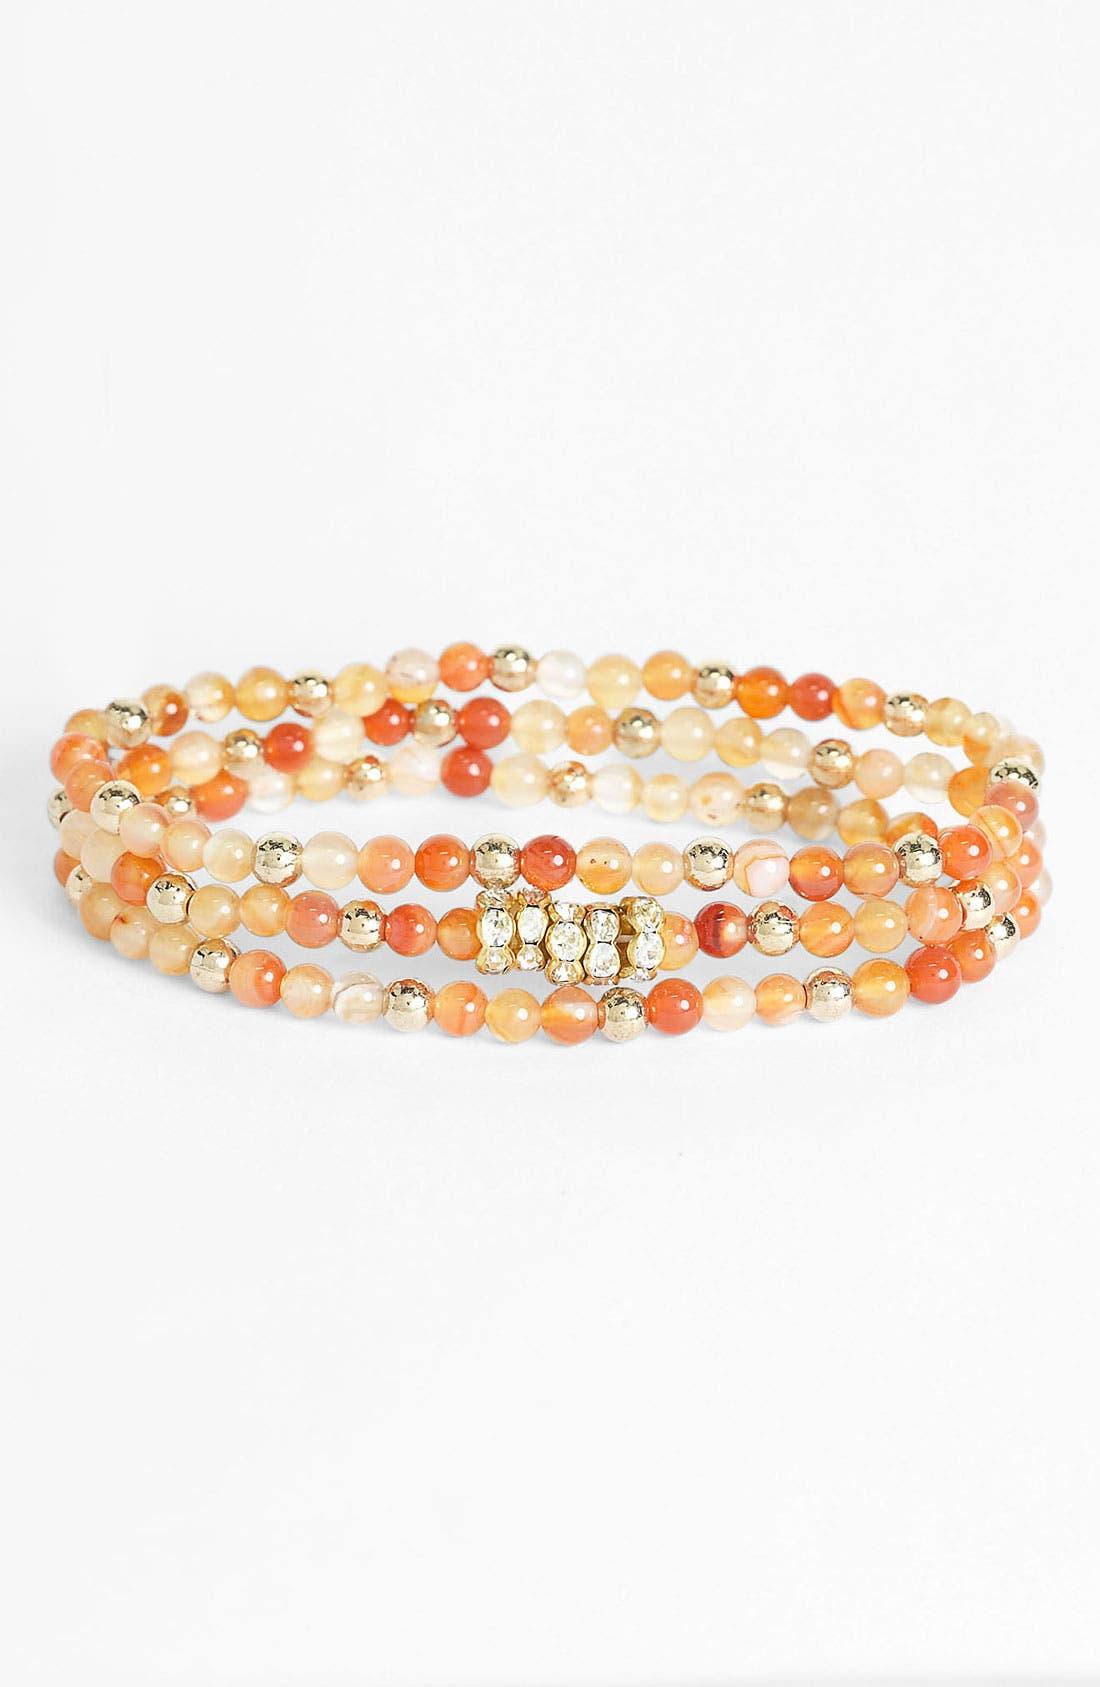 Main Image - Cara Bead Stretch Bracelets (Set of 3)